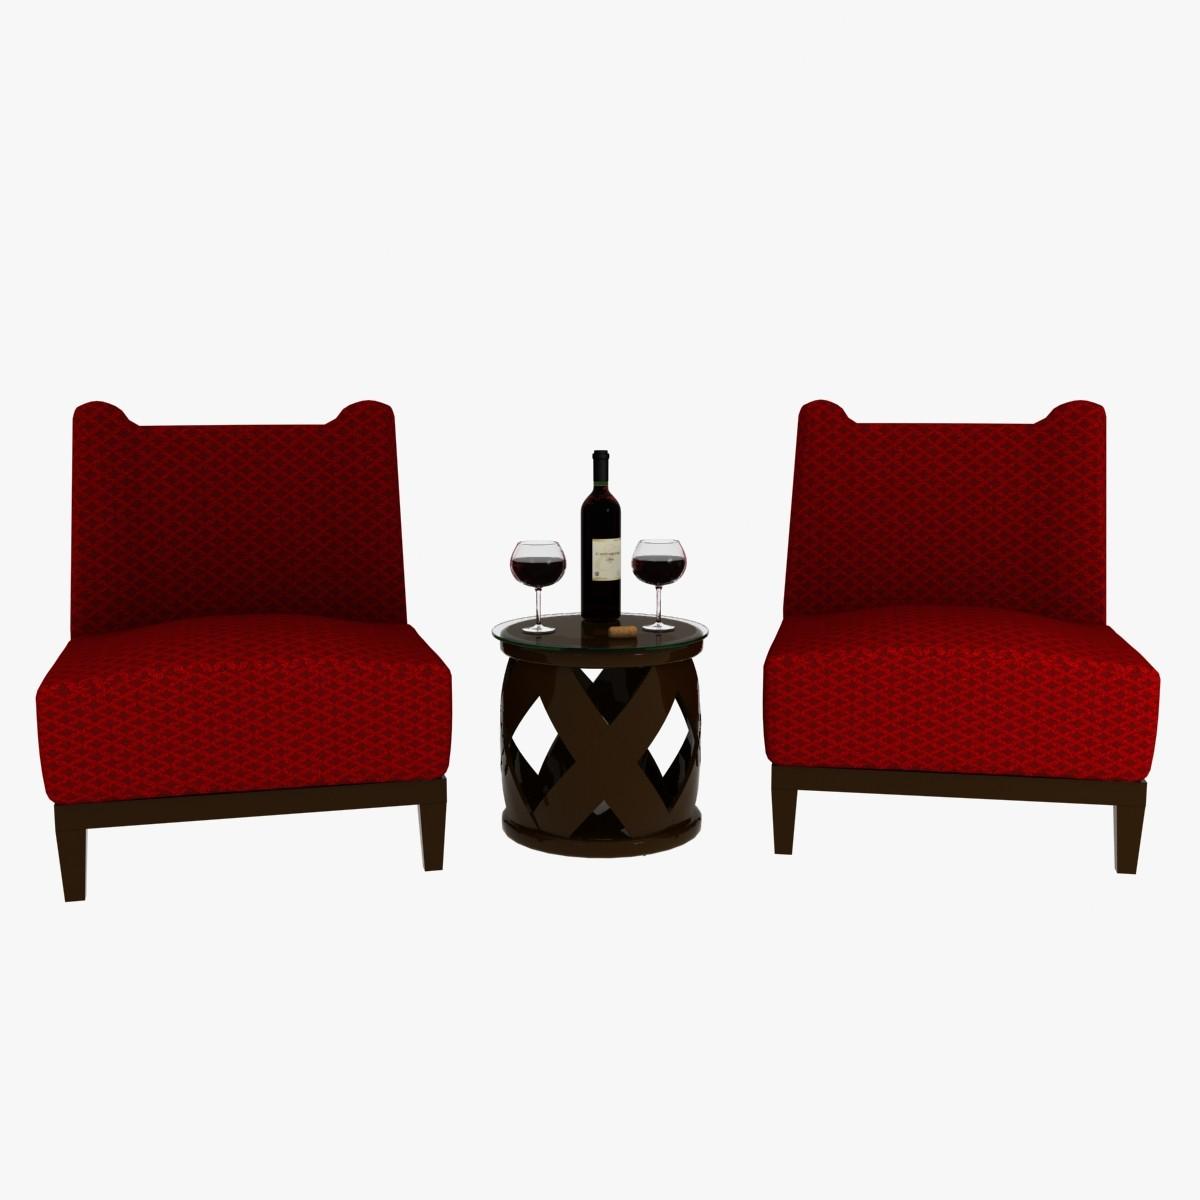 Contemporary_Chair_Model_Camera01_Thumbnail_29_SI_1200.JPG